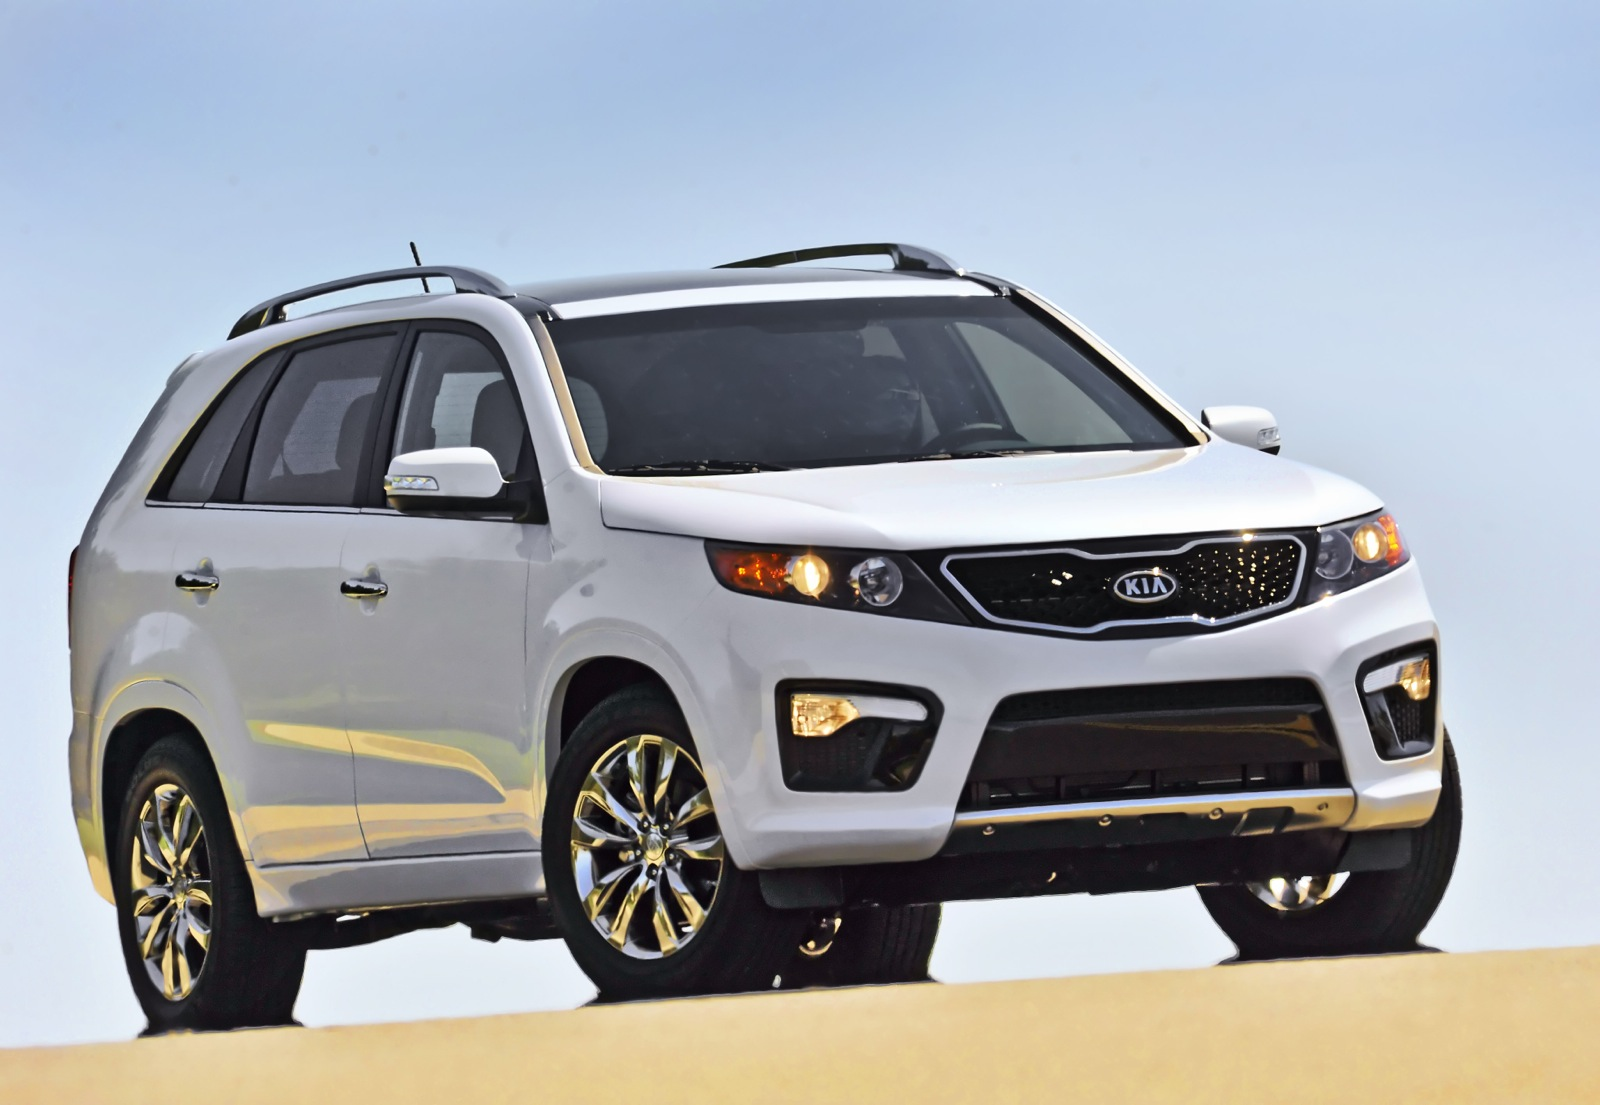 2013 Kia Sorento Review Ratings Specs Prices And